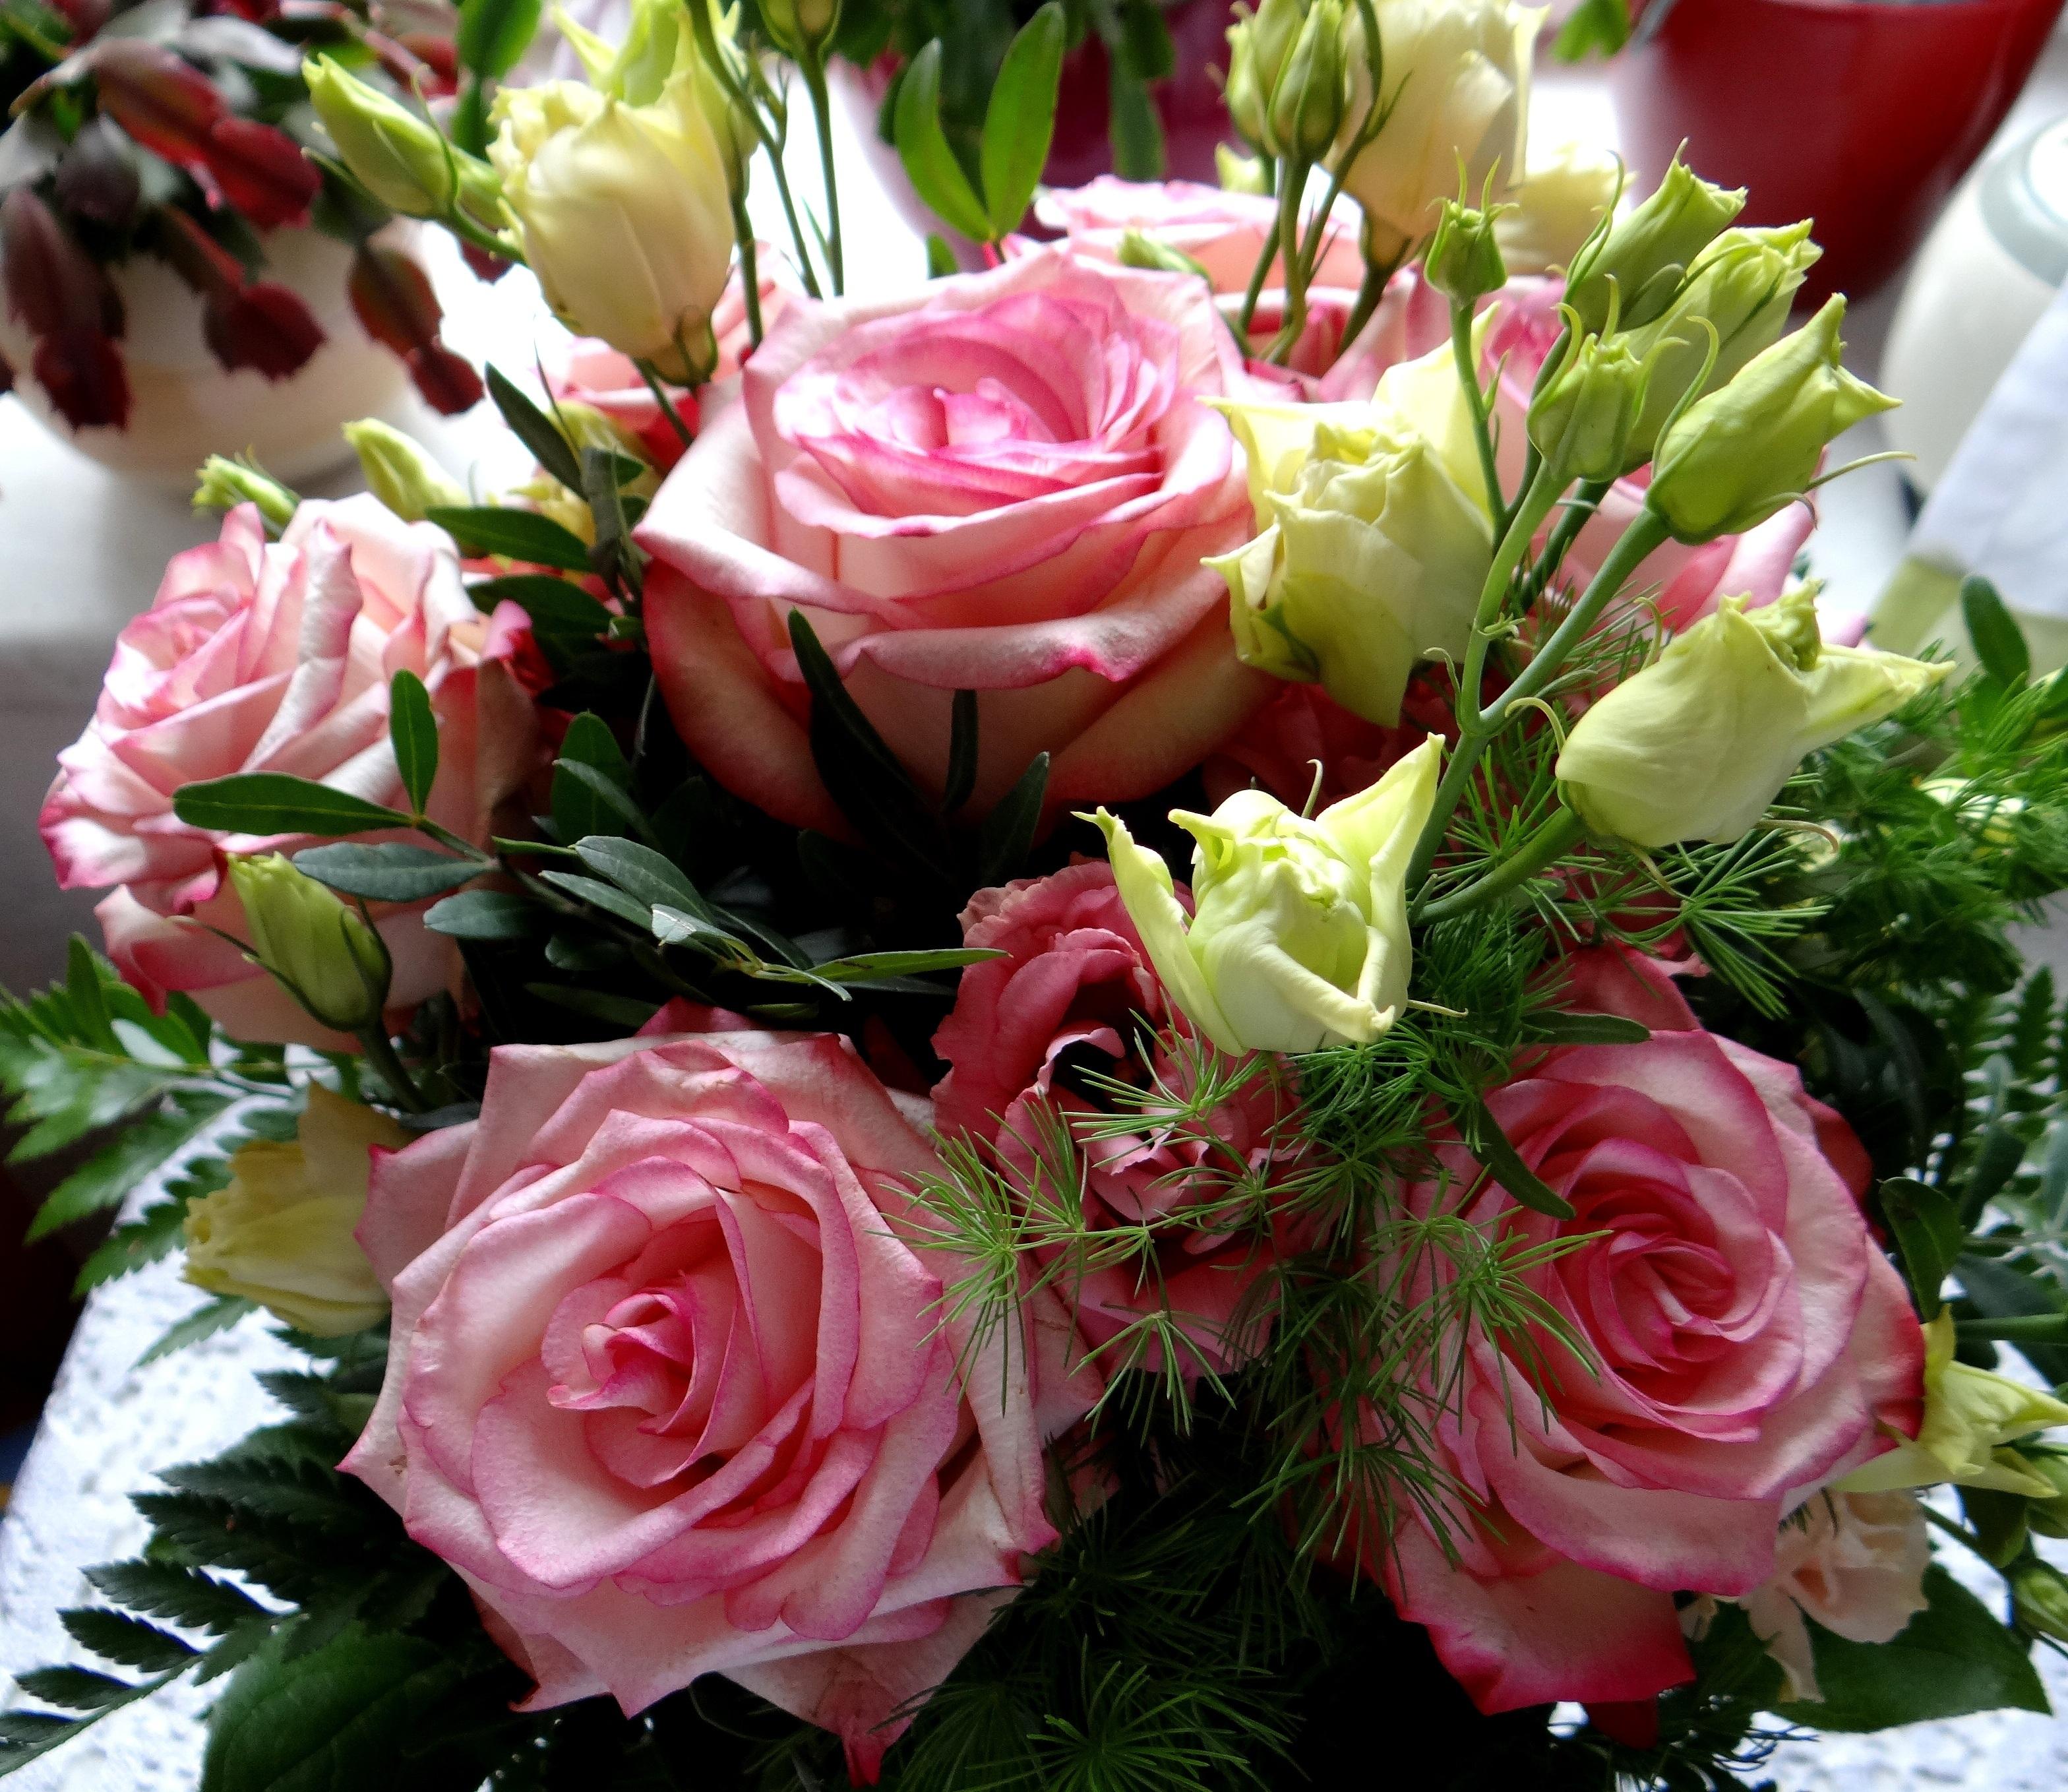 Garden Roses Flower Petal: Free Images : Petal, Love, Pink, Birthday, Bouquet Of